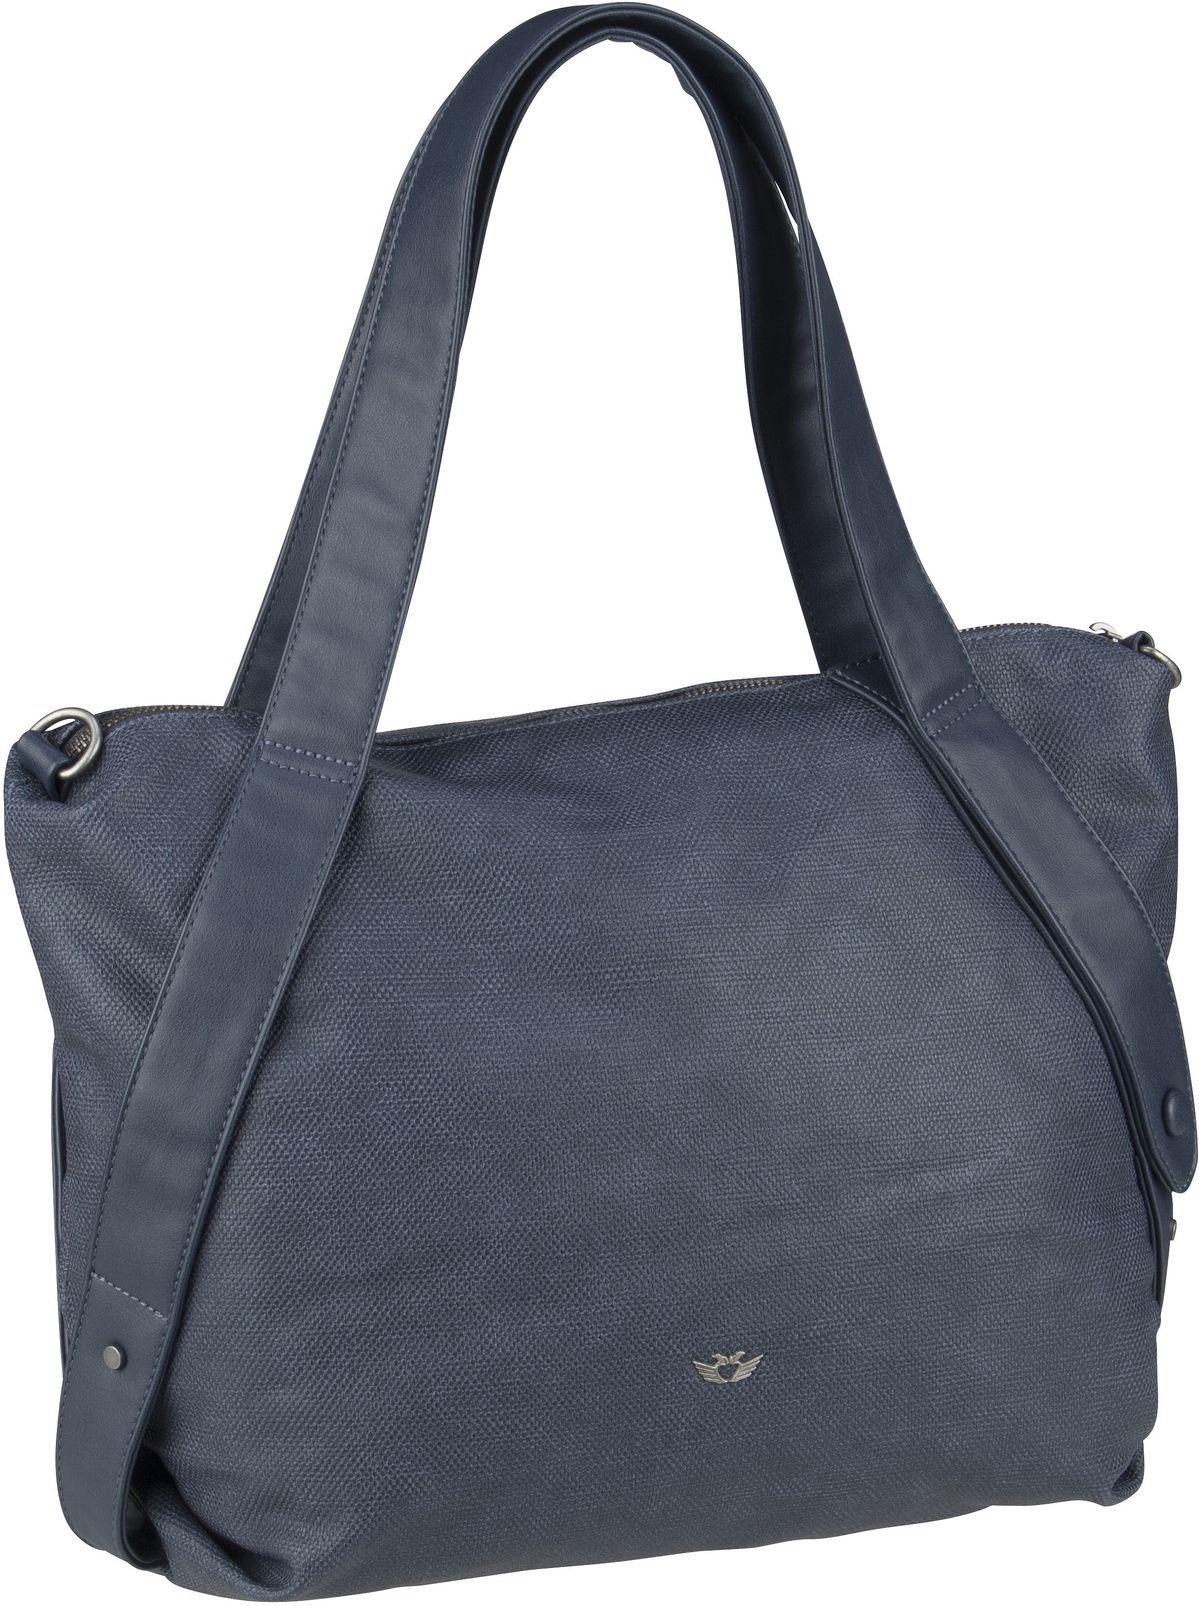 Handtasche Alla Pixley Navy